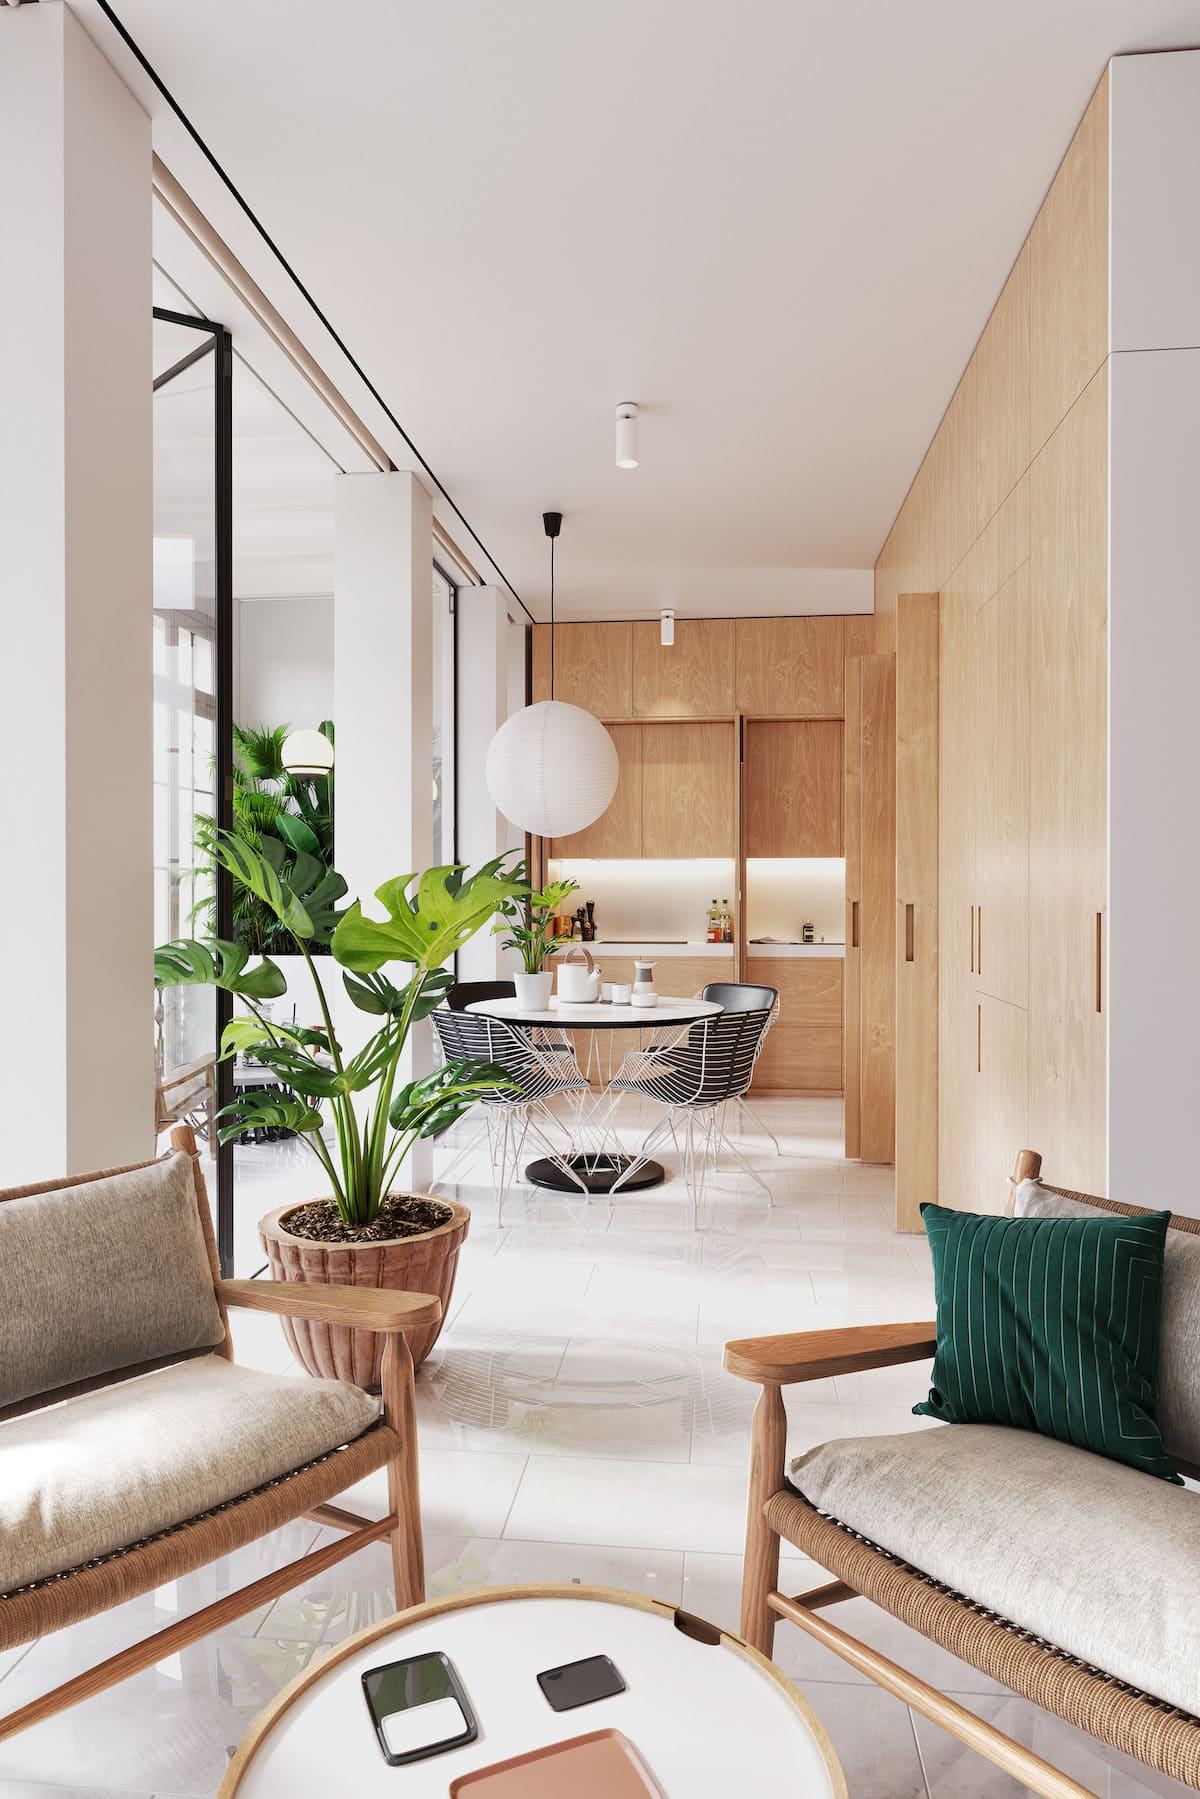 дизайн интерьера модной квартиры фото 11